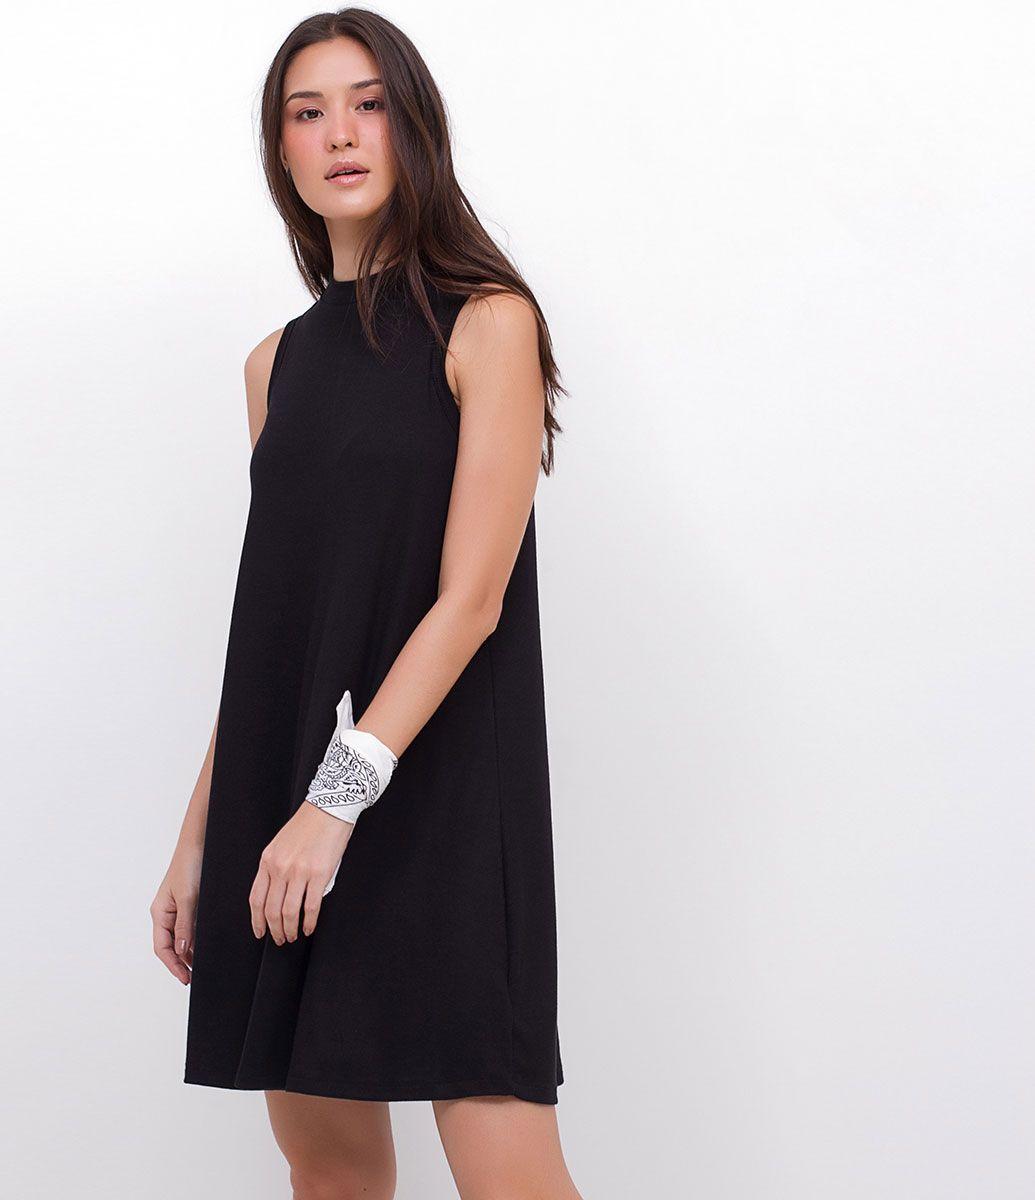 6d16ae4c0a Vestido feminino Sem mangas Com gola alta Marca  Blue Steel R  69